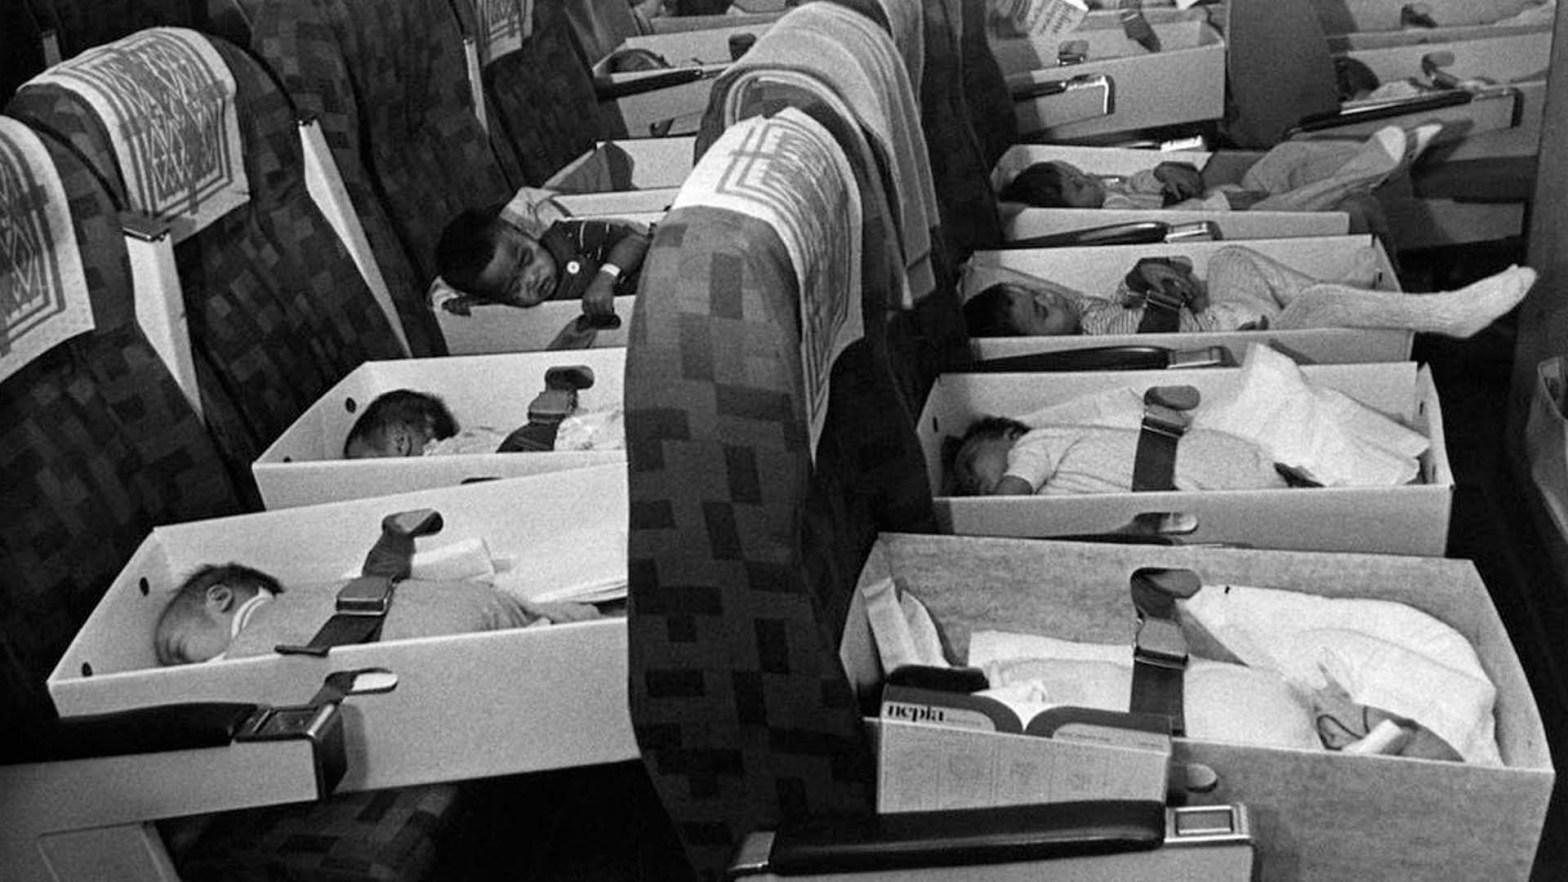 Operazione Babylift in Vietnam